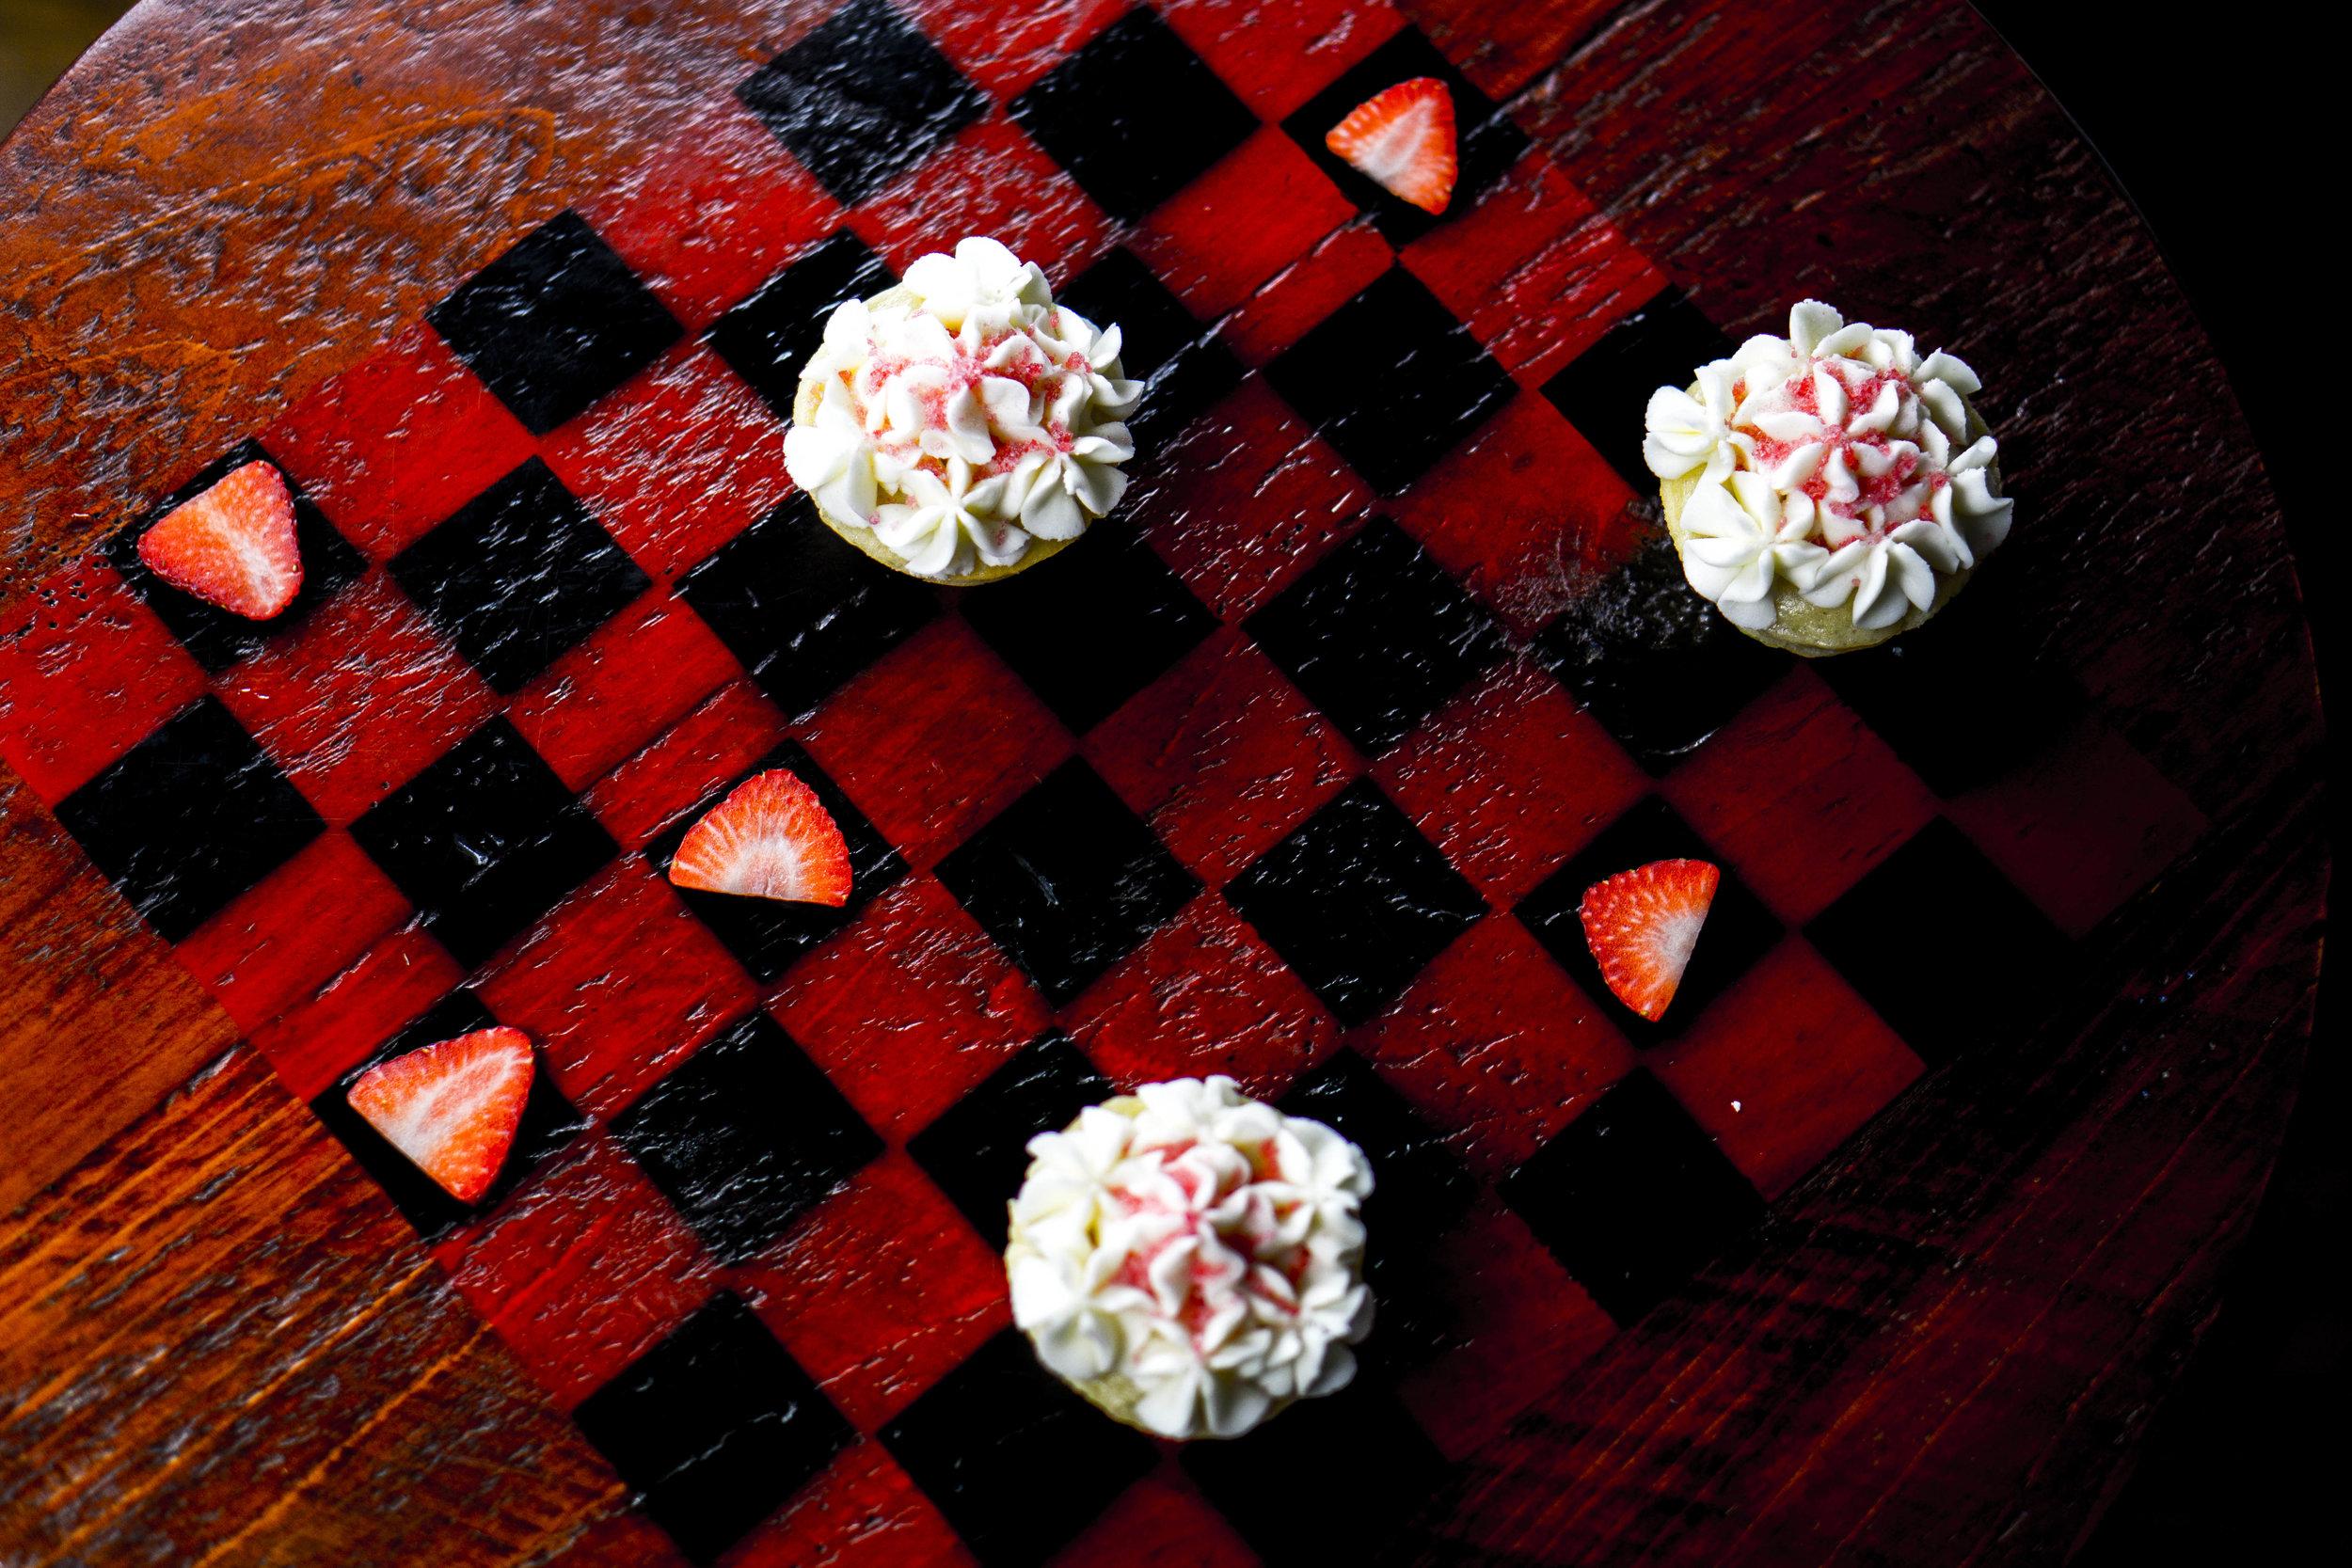 Cupcakes6_BearLake-the-sassy-gourmet.JPG